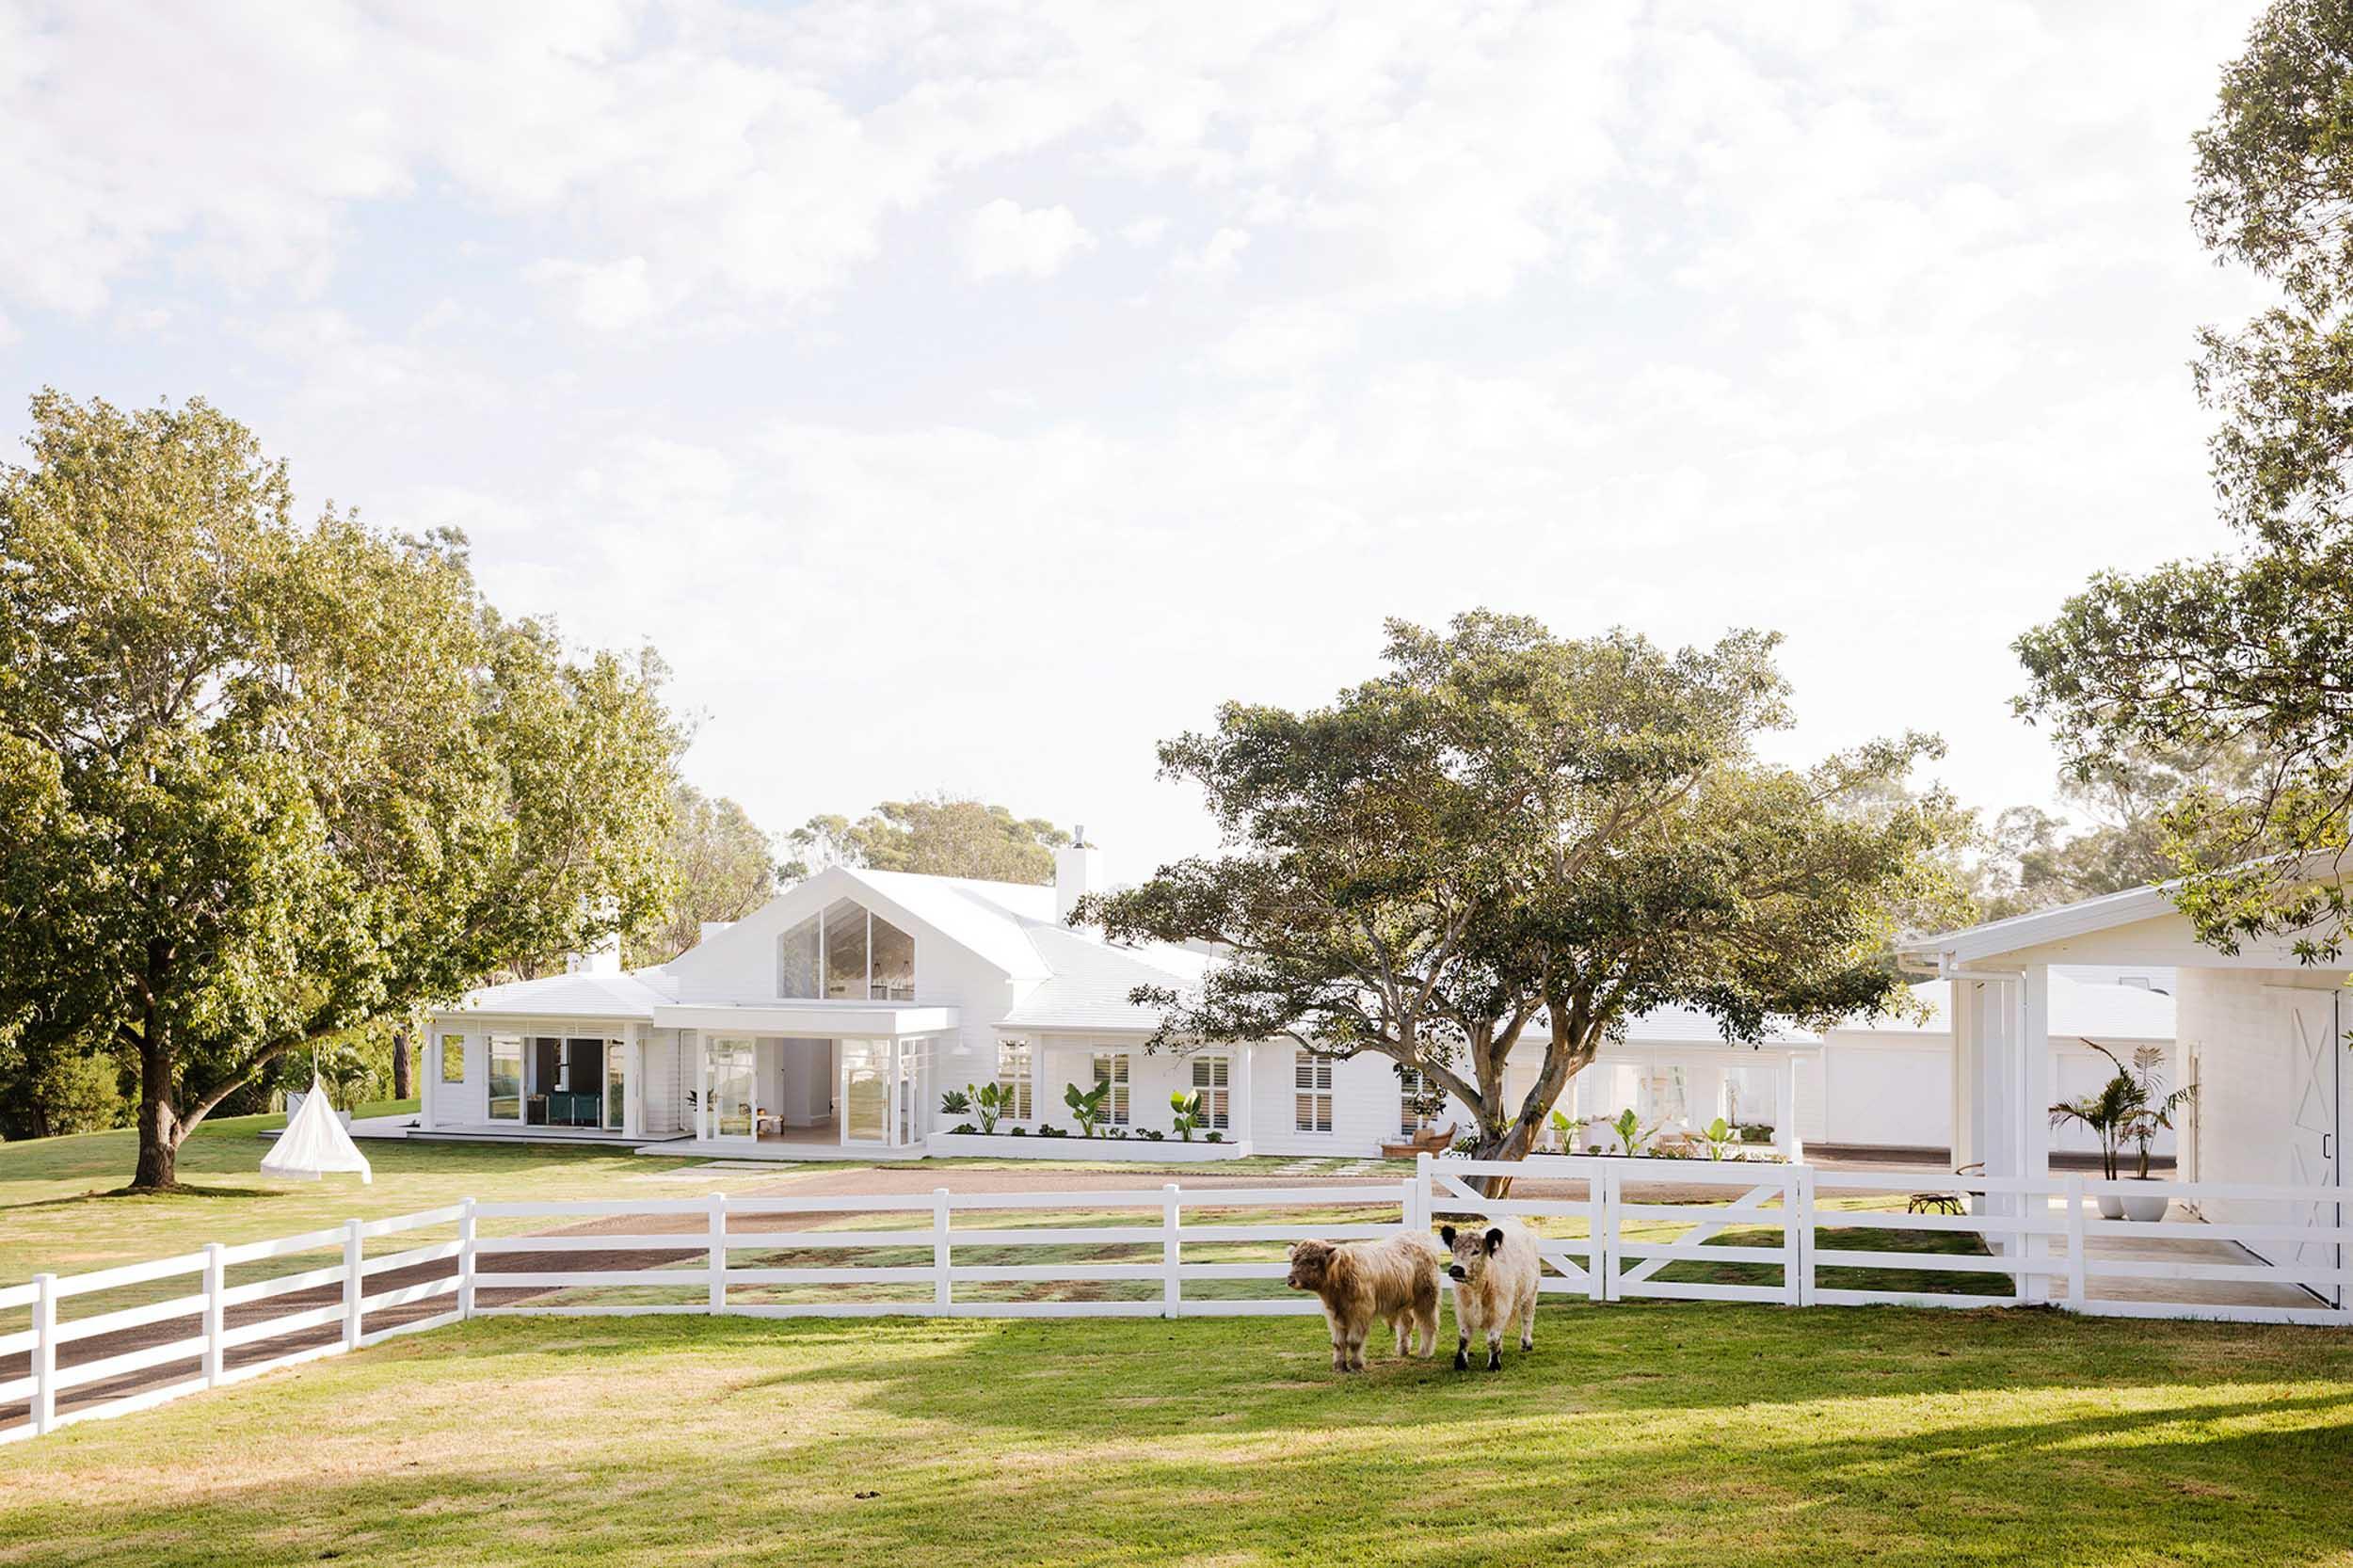 Exterior Bonnies Dream Home.jpg